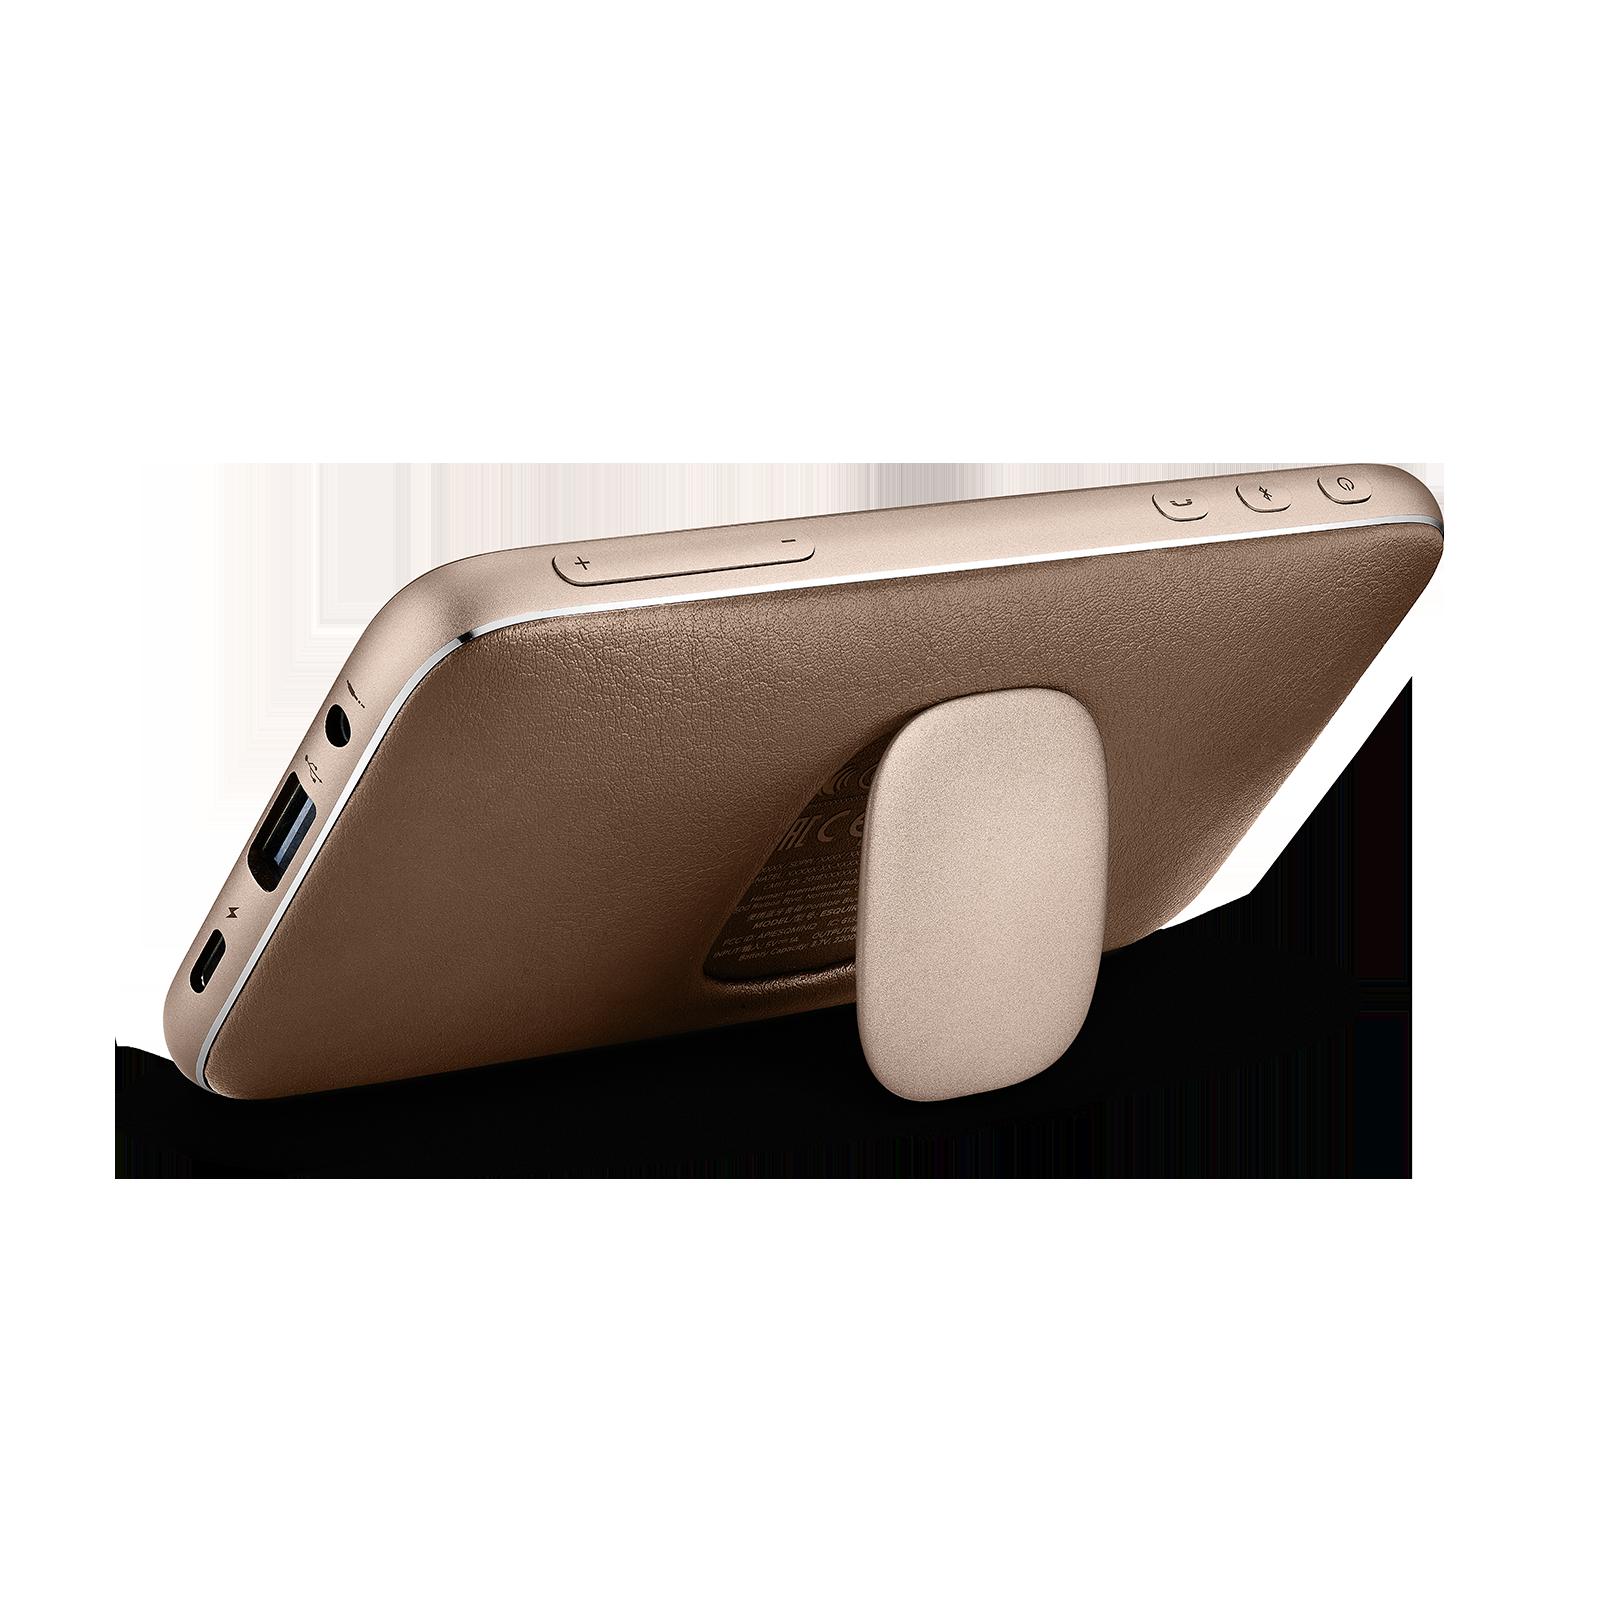 Harman Kardon Esquire Mini 2 - Brown - Ultra-slim and portable premium Bluetooth Speaker - Back